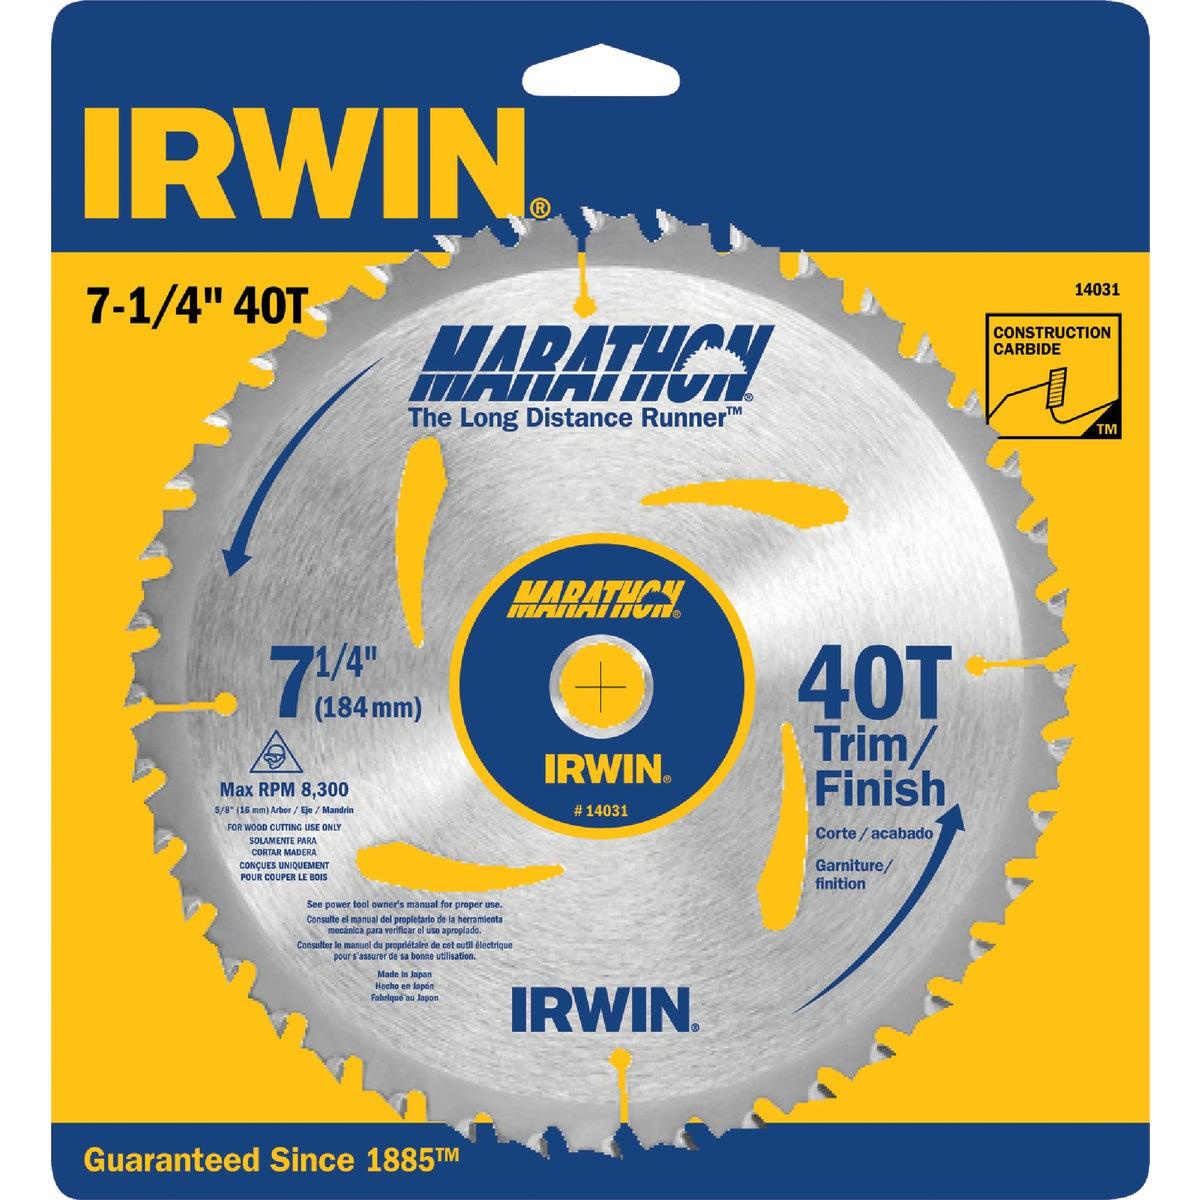 "7-1/4""40T MARATHON BLADE - 14031 by Irwin Industr Tool"